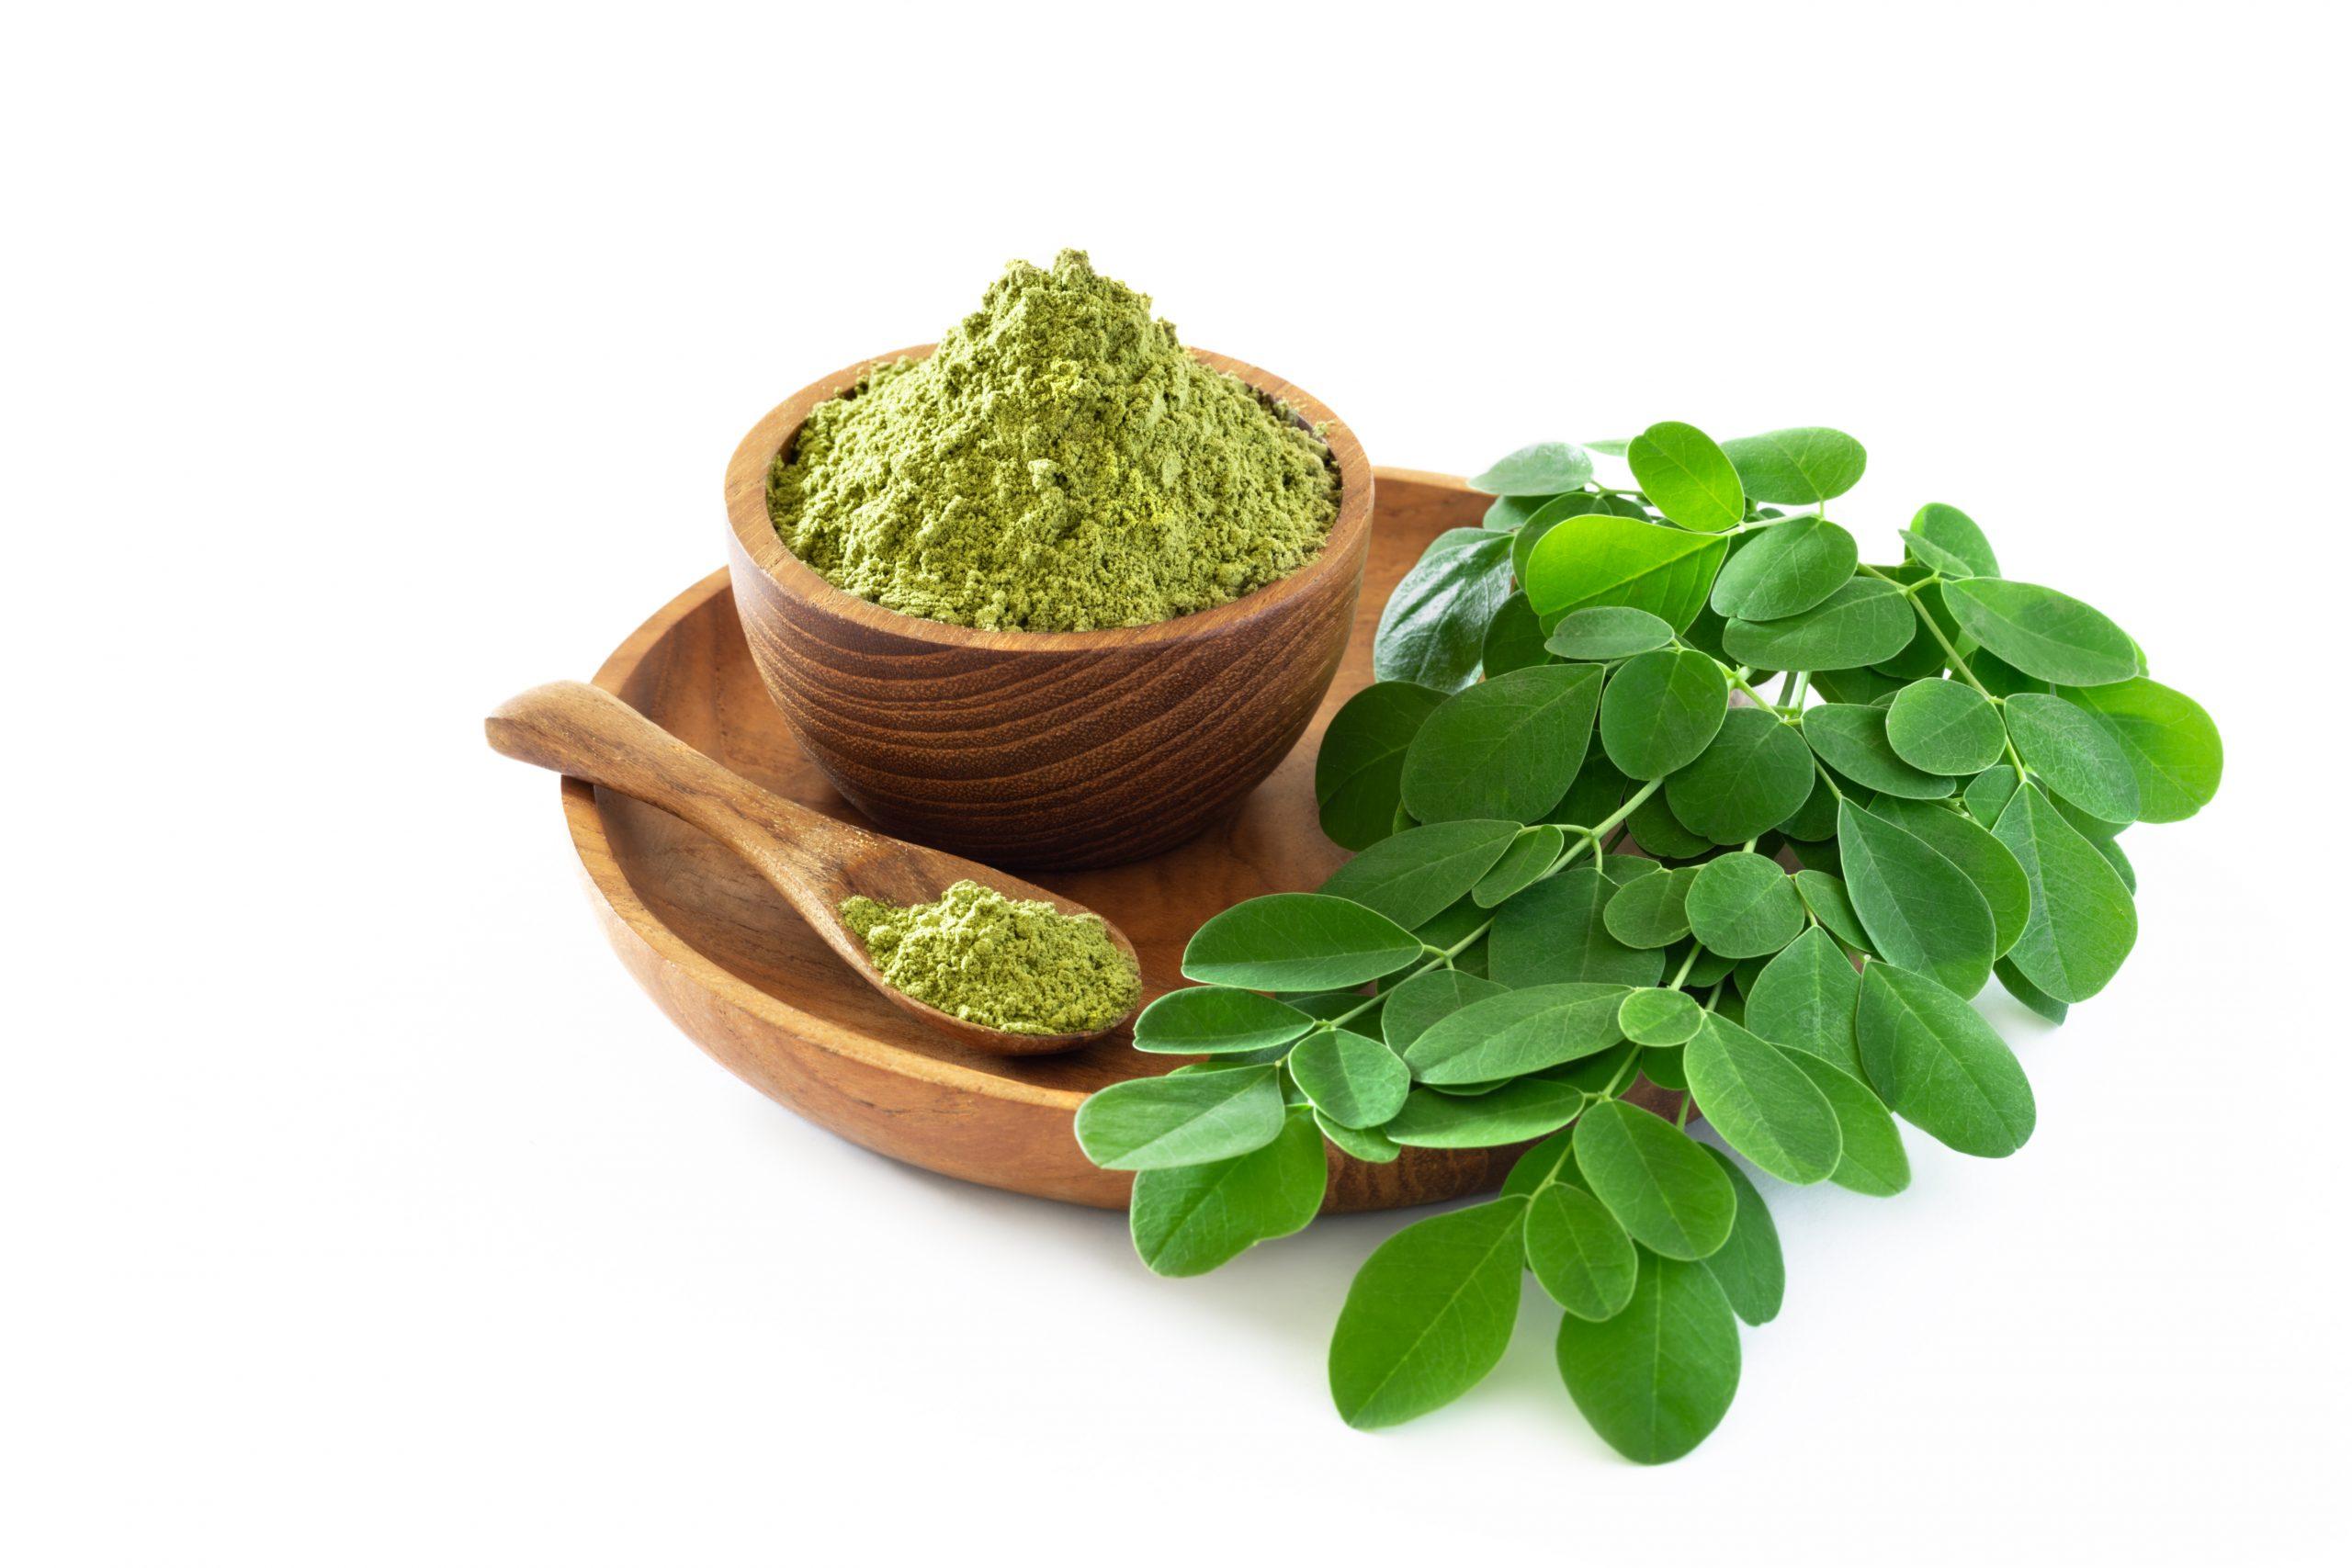 Moringa powder in wooden bowl with original fresh Moringa leaves